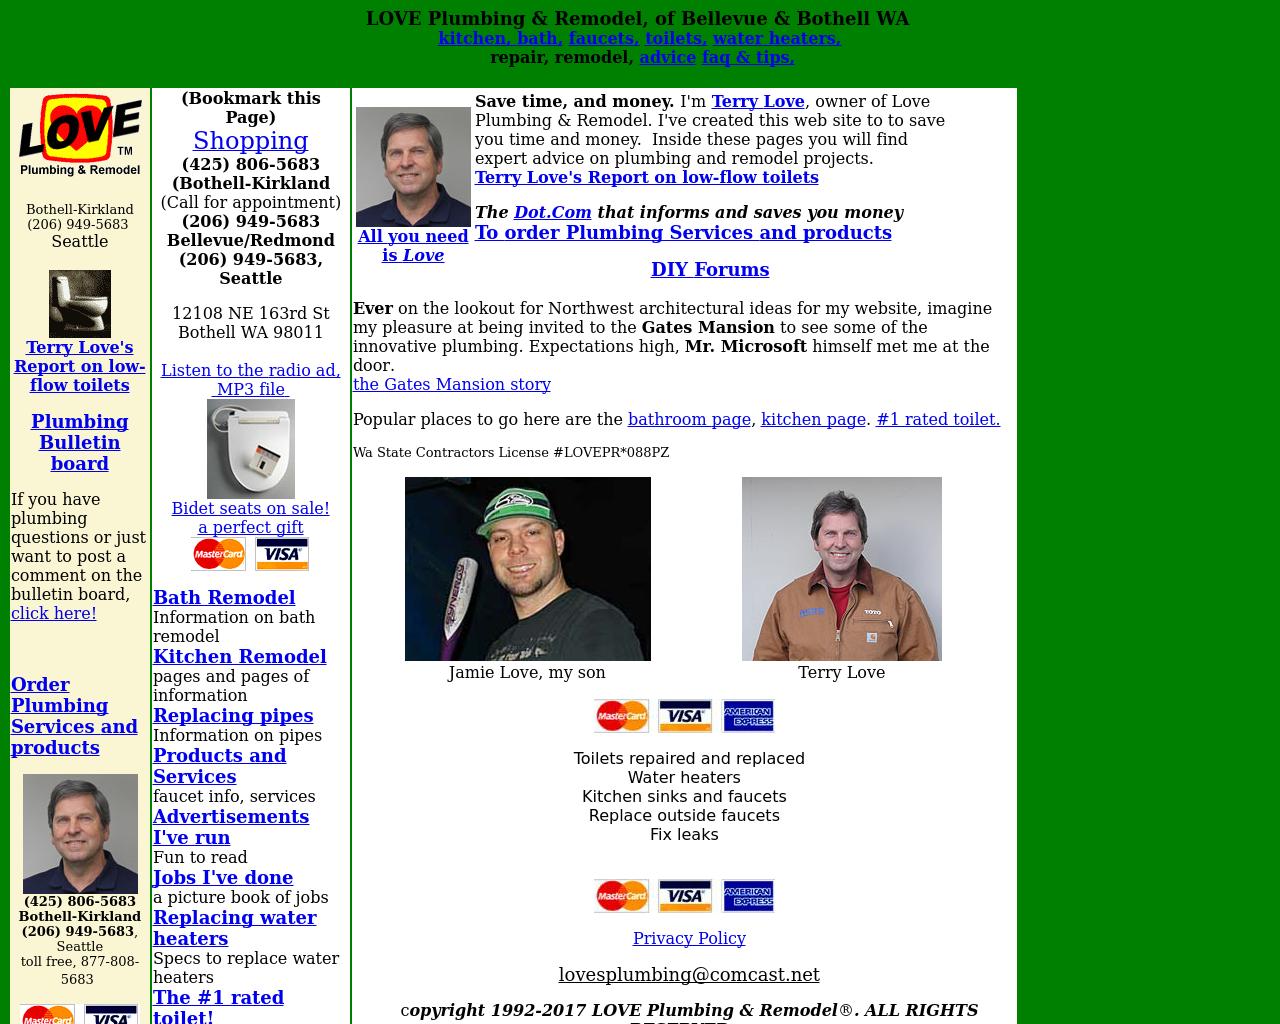 Love-Plumbing-&-Remodel-Advertising-Reviews-Pricing